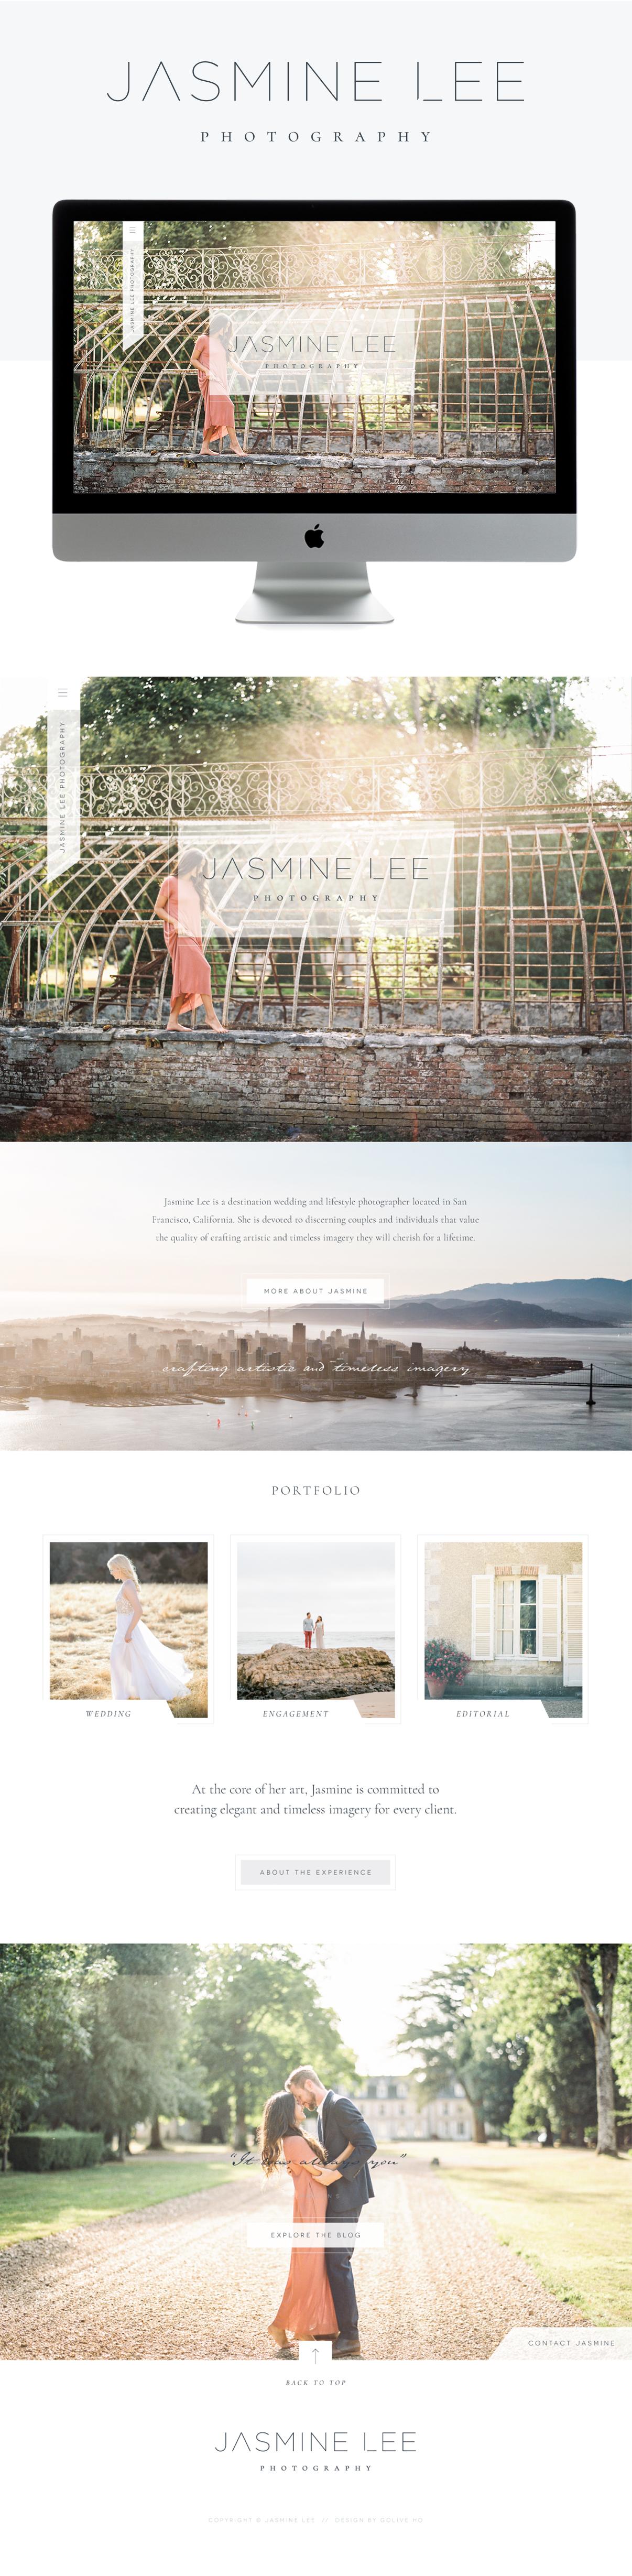 Modern, luxury, clean, chic, mature, feminine, editorial & romantic showit website design | designed by: golivehq.co